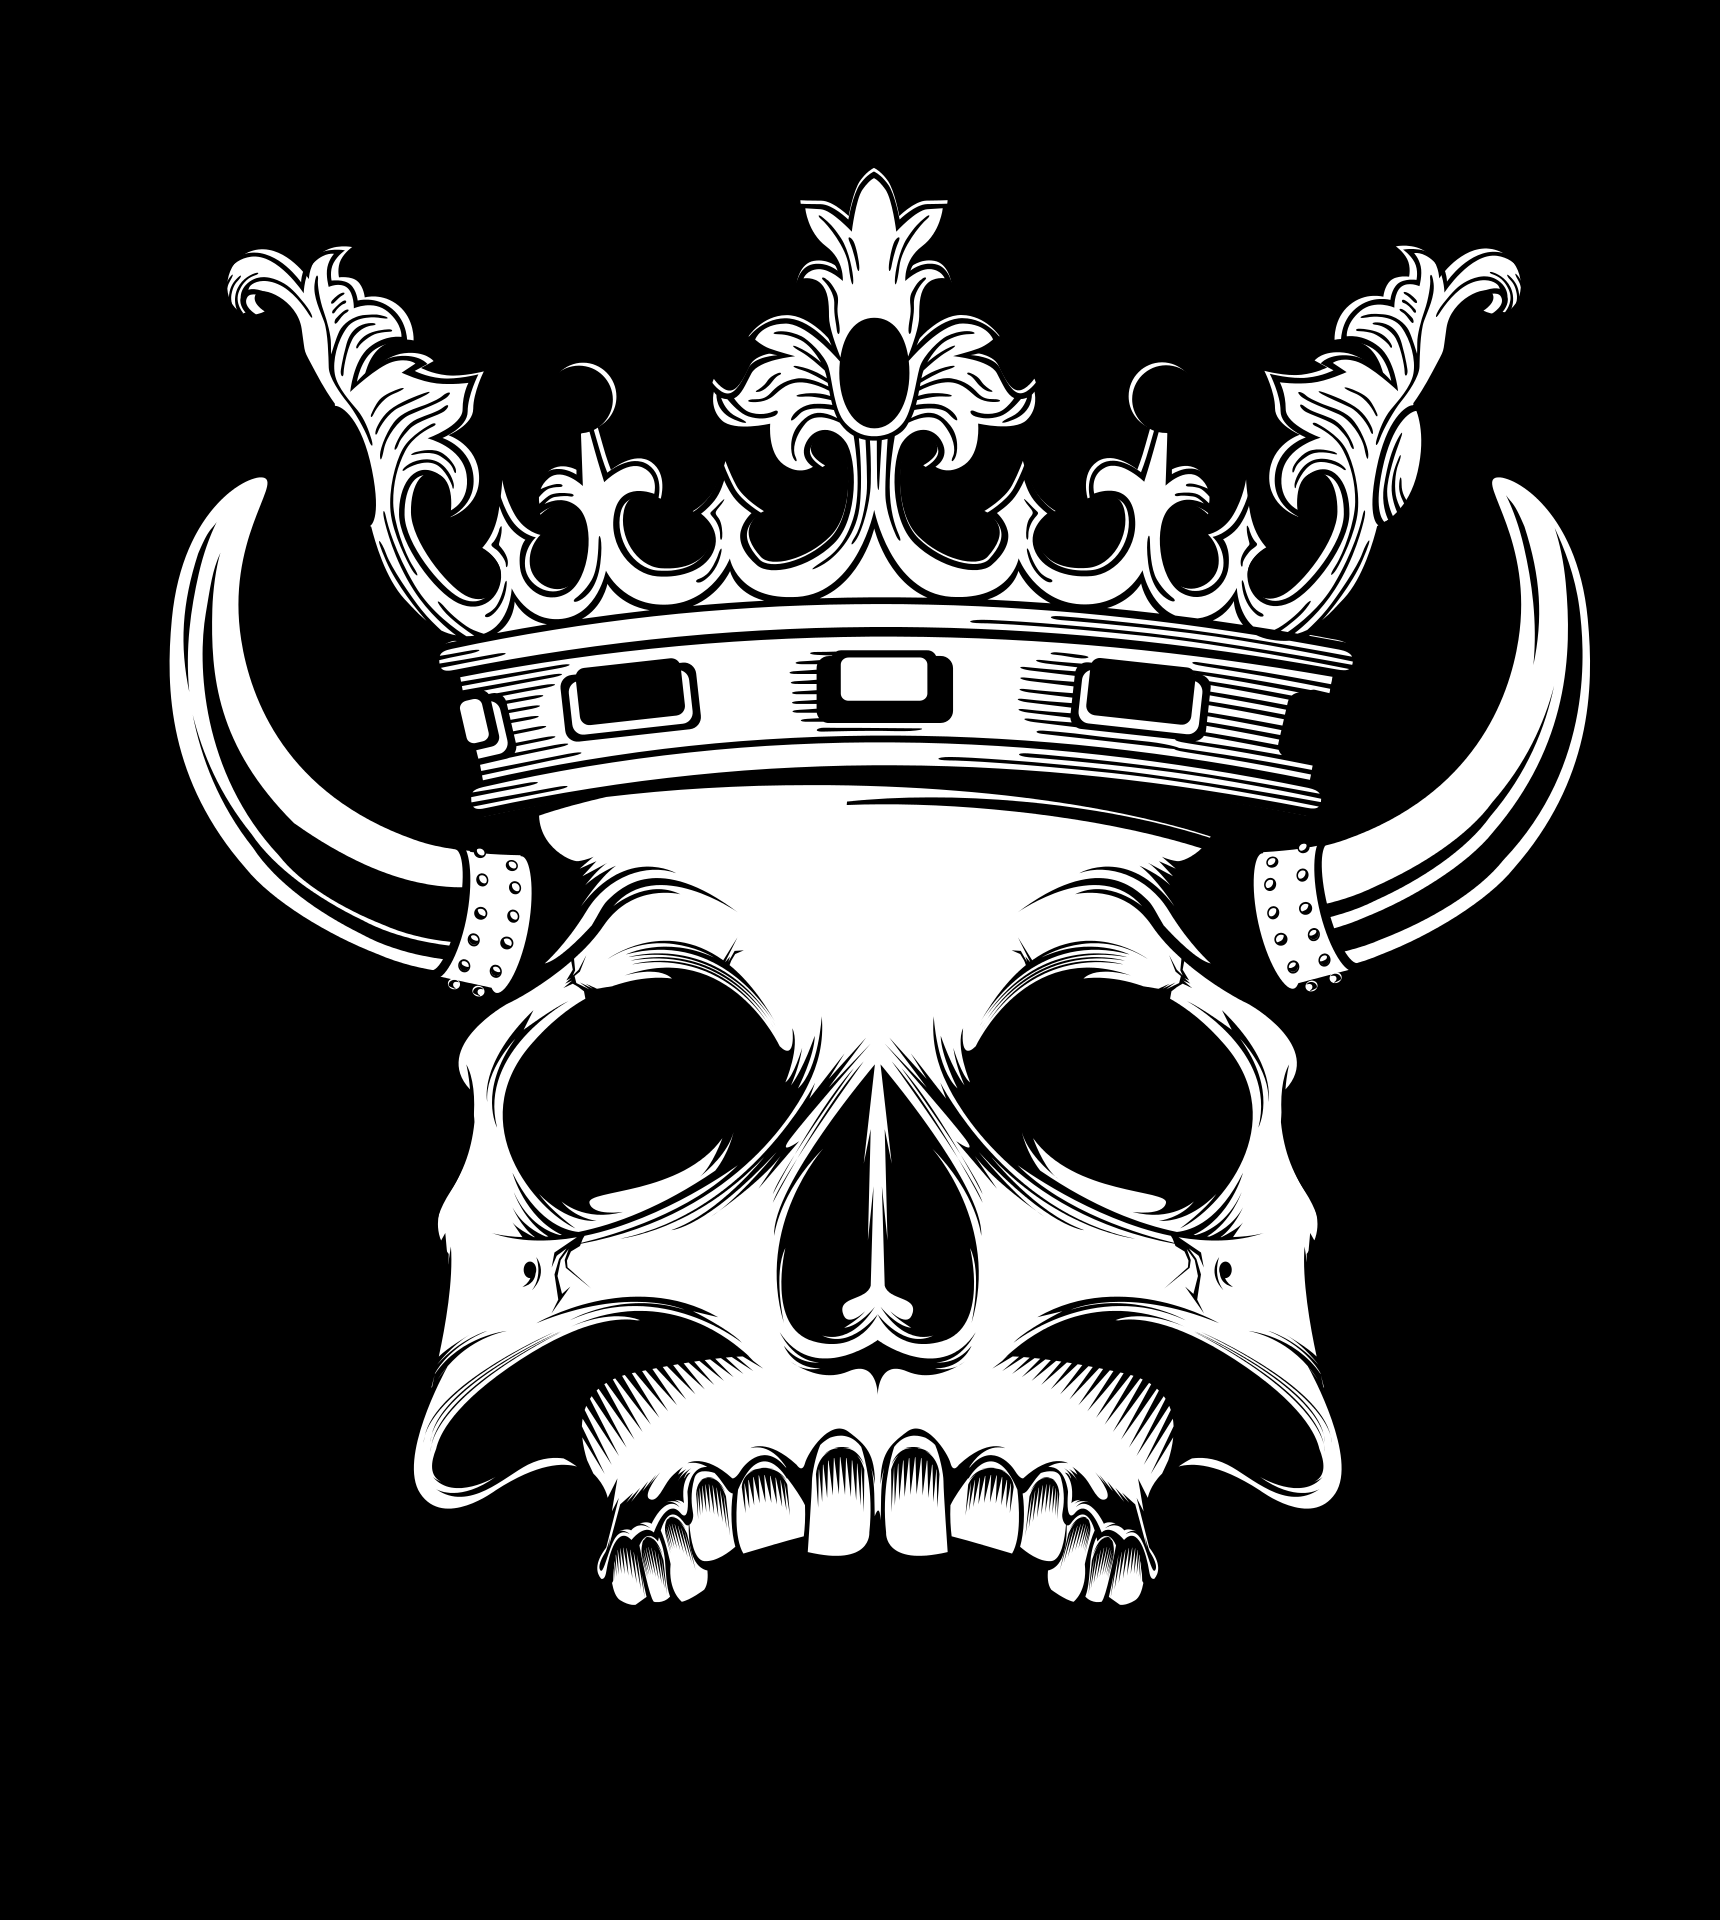 Skull with Horns and Crown, Printing, Shirt, Skull, Print, HQ Photo